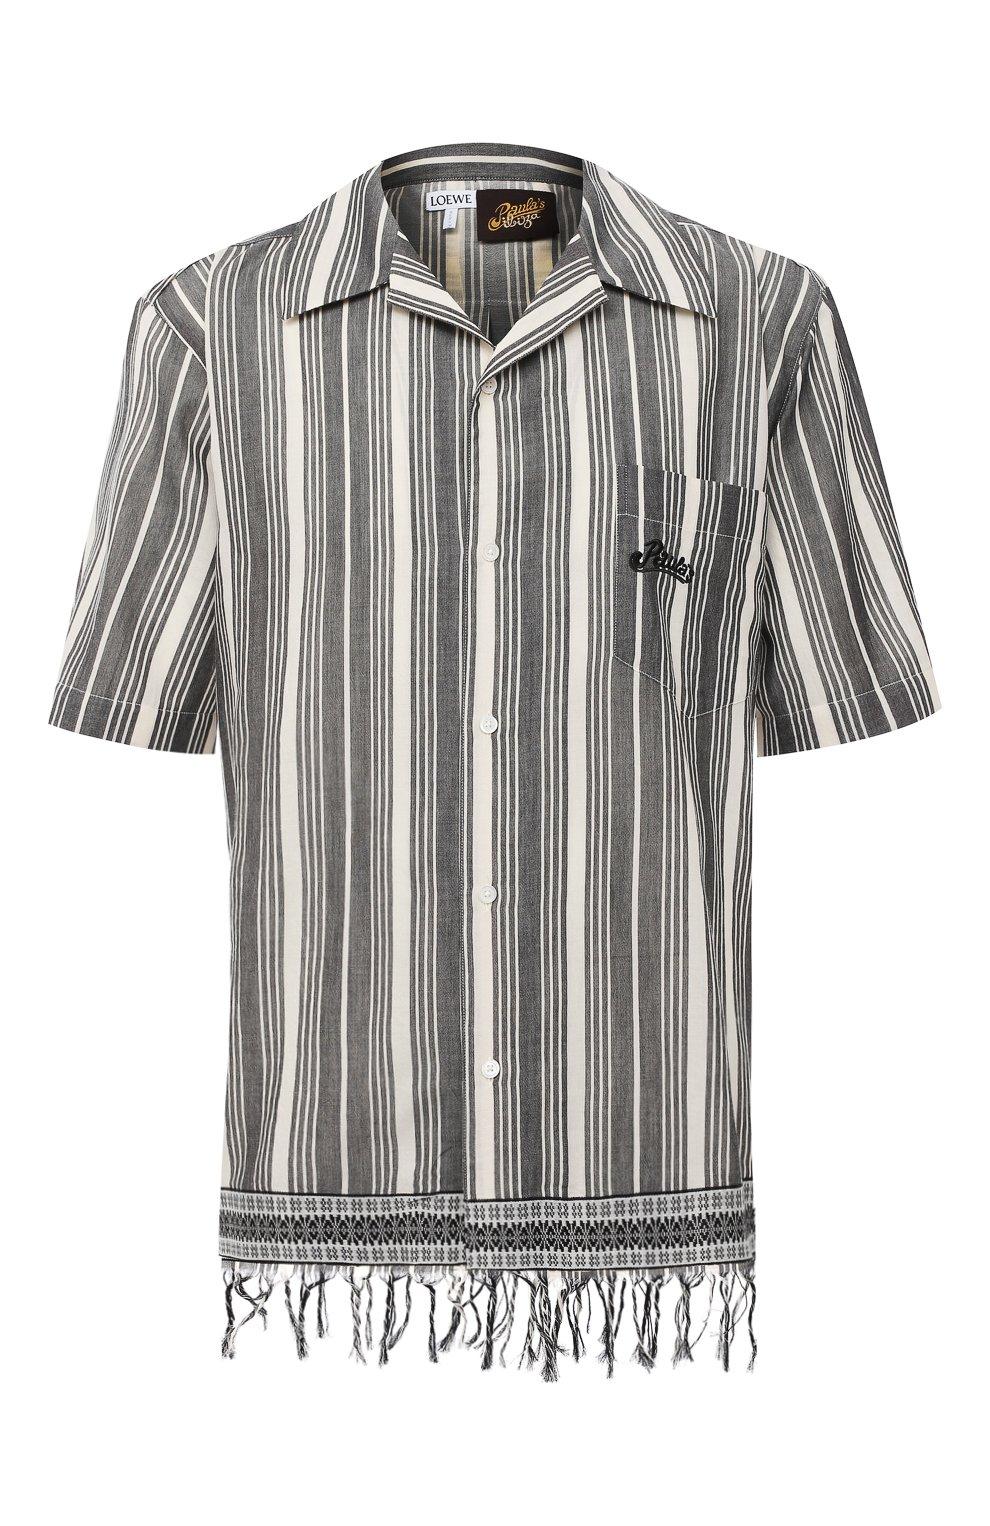 Мужская хлопковая рубашка loewe x paula's ibiza LOEWE черно-белого цвета, арт. H616337X30   Фото 1